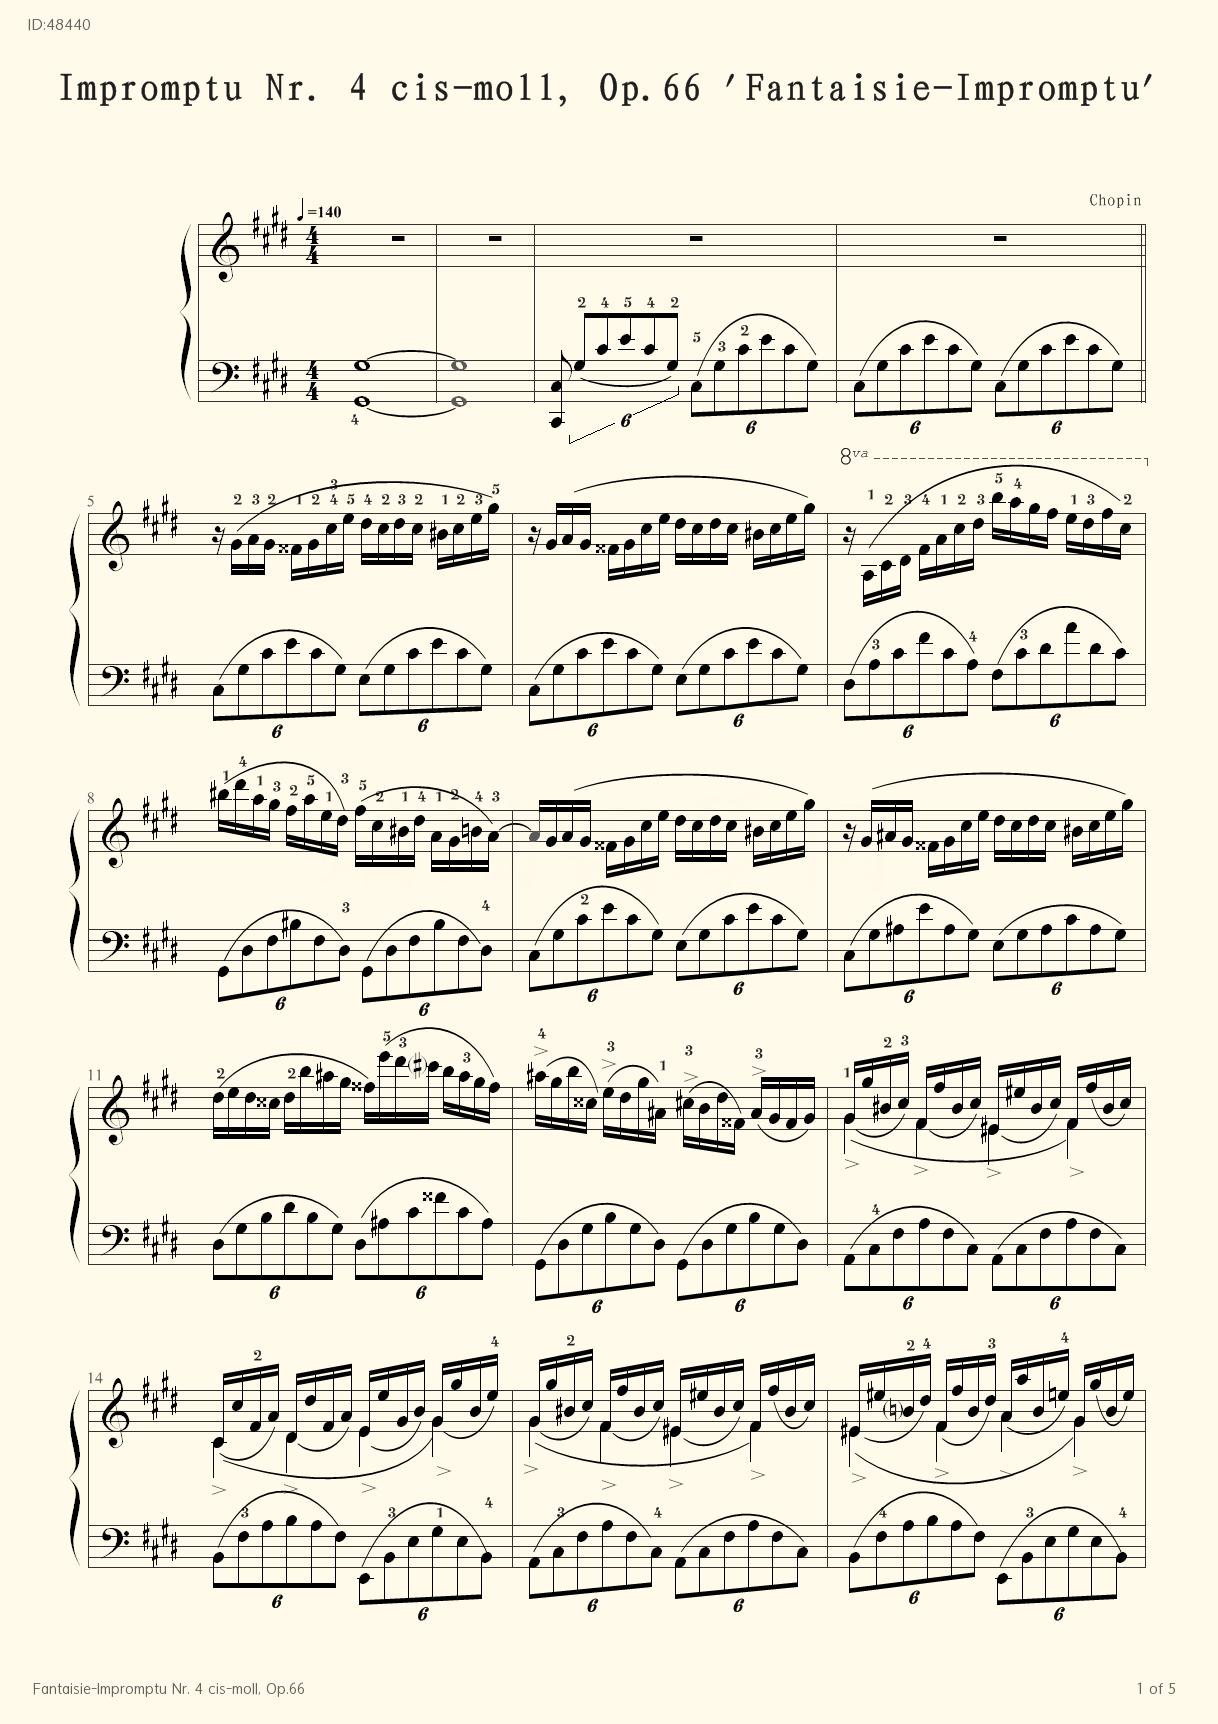 Fantaisie-Impromptu Nr. 4 cis-moll, Op.66 - chopin - first page